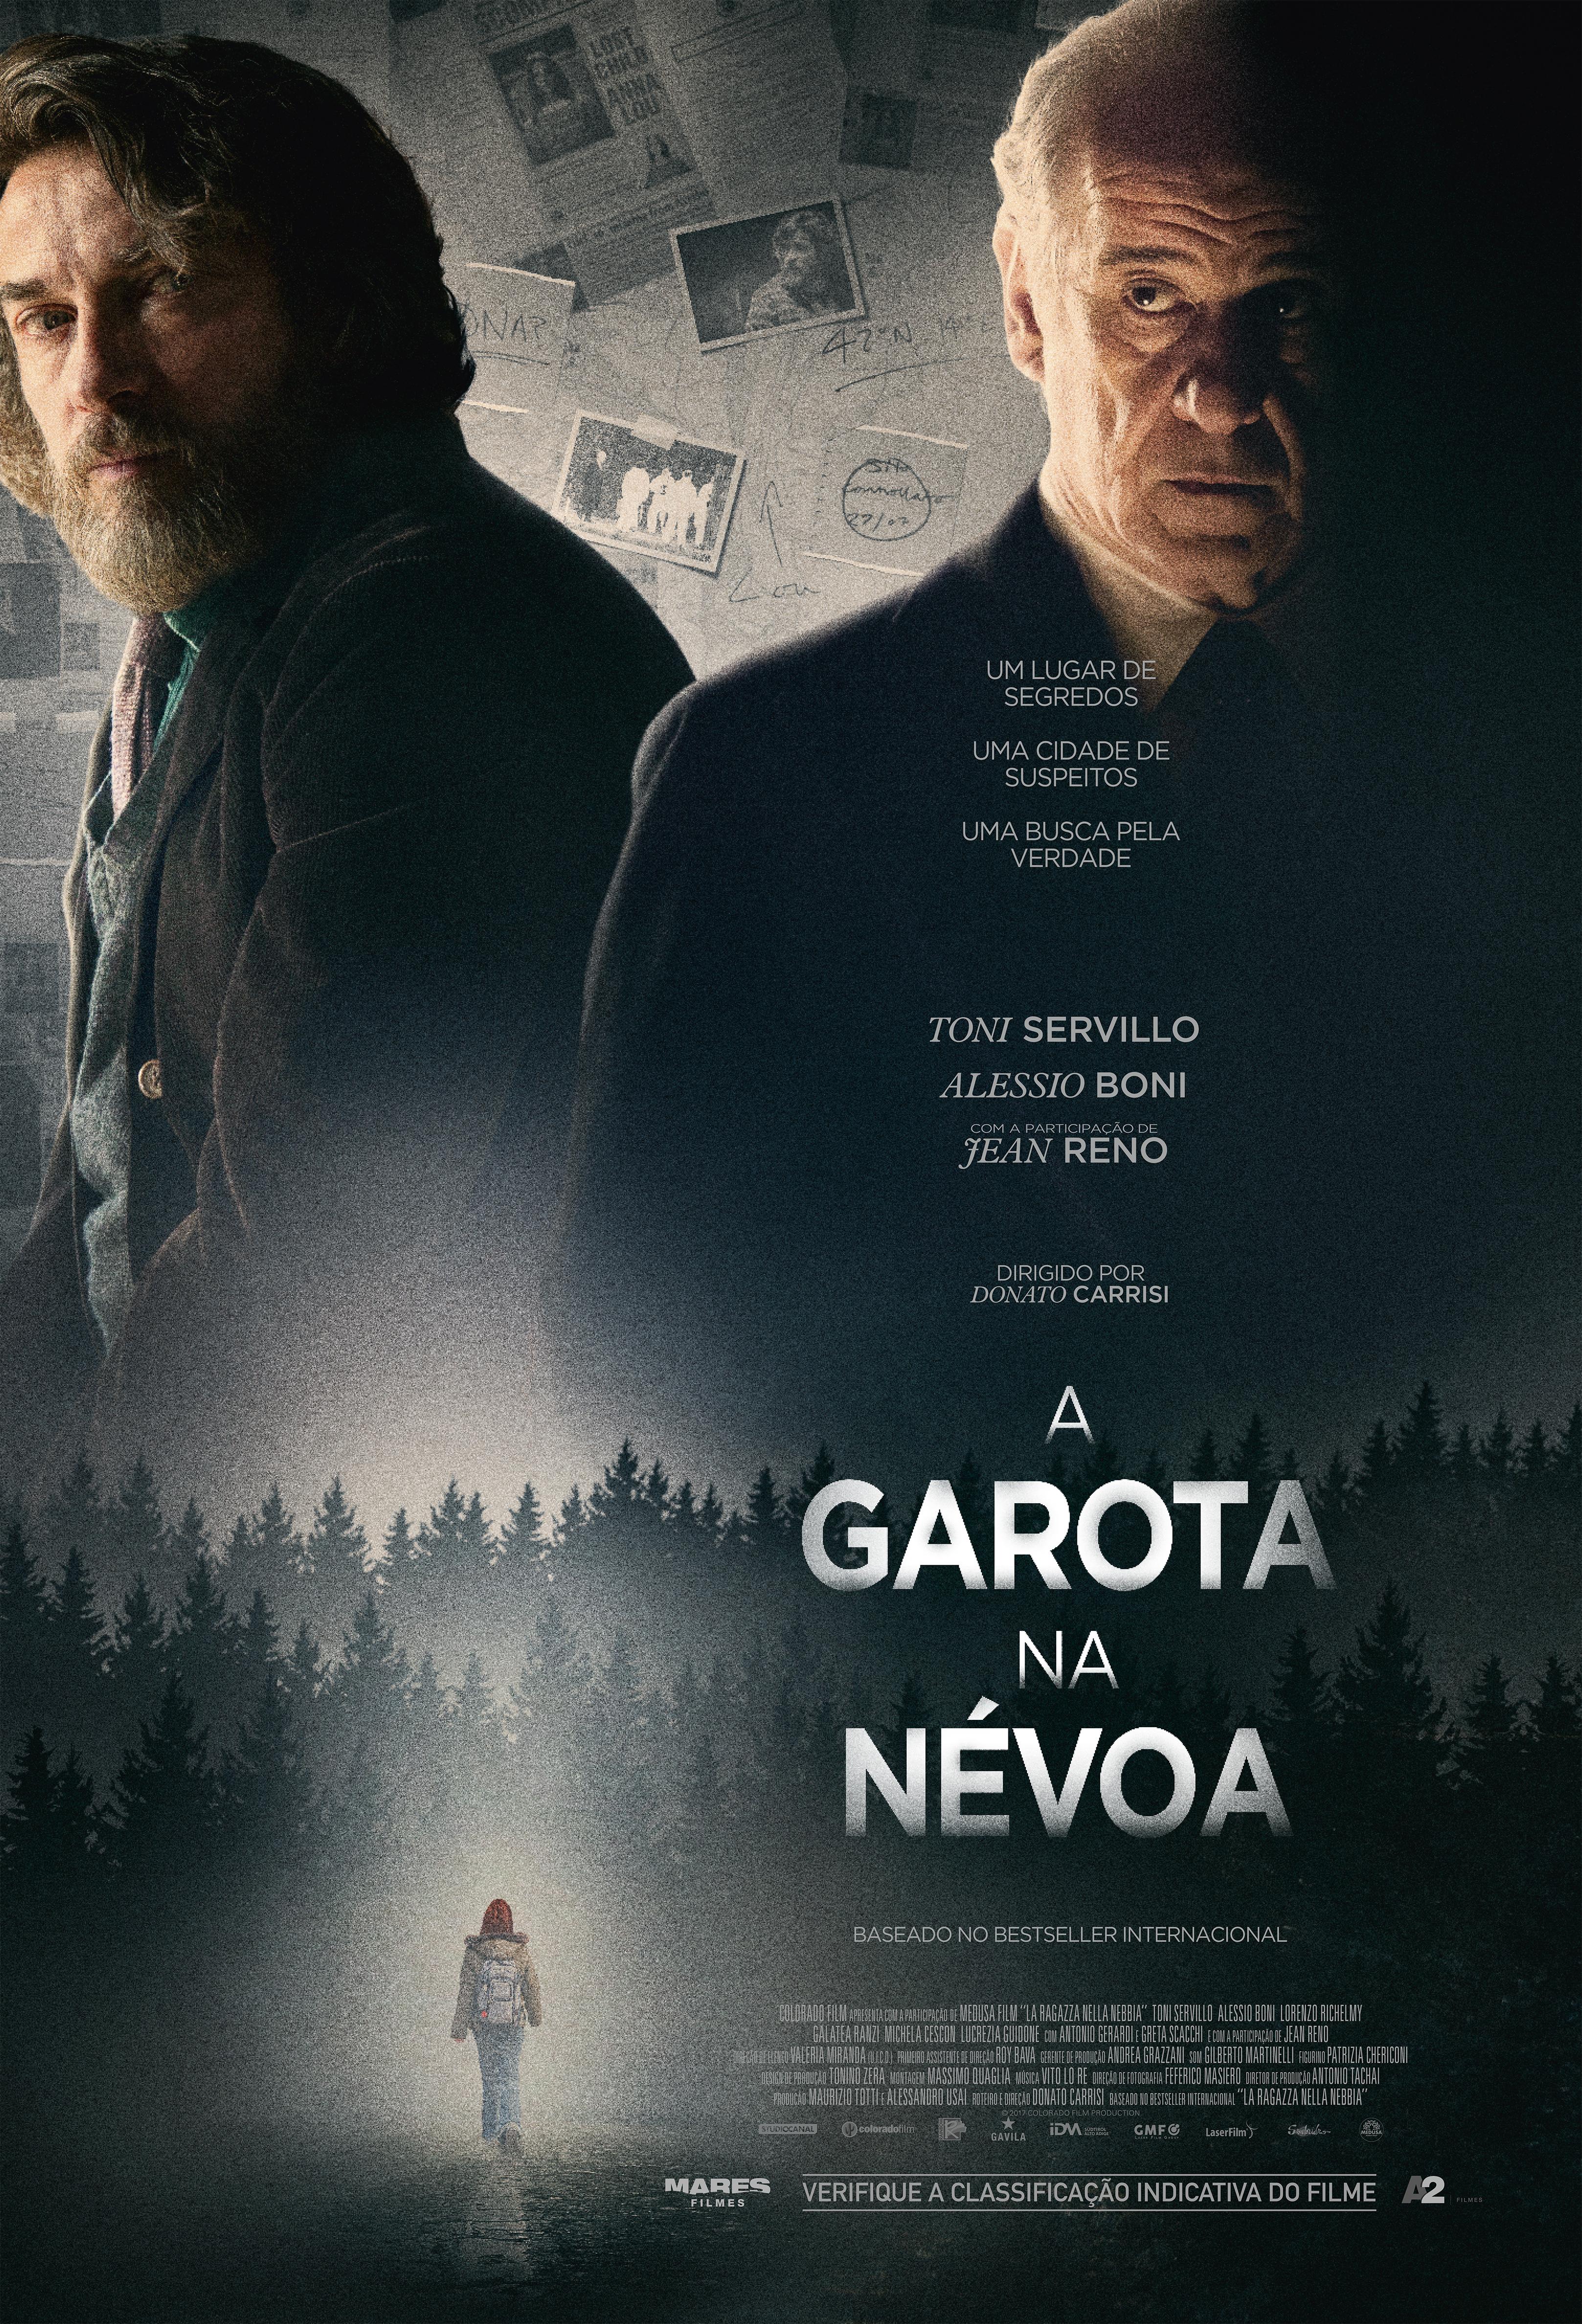 Poster-A-Garota-Na-Nevoa-Alta